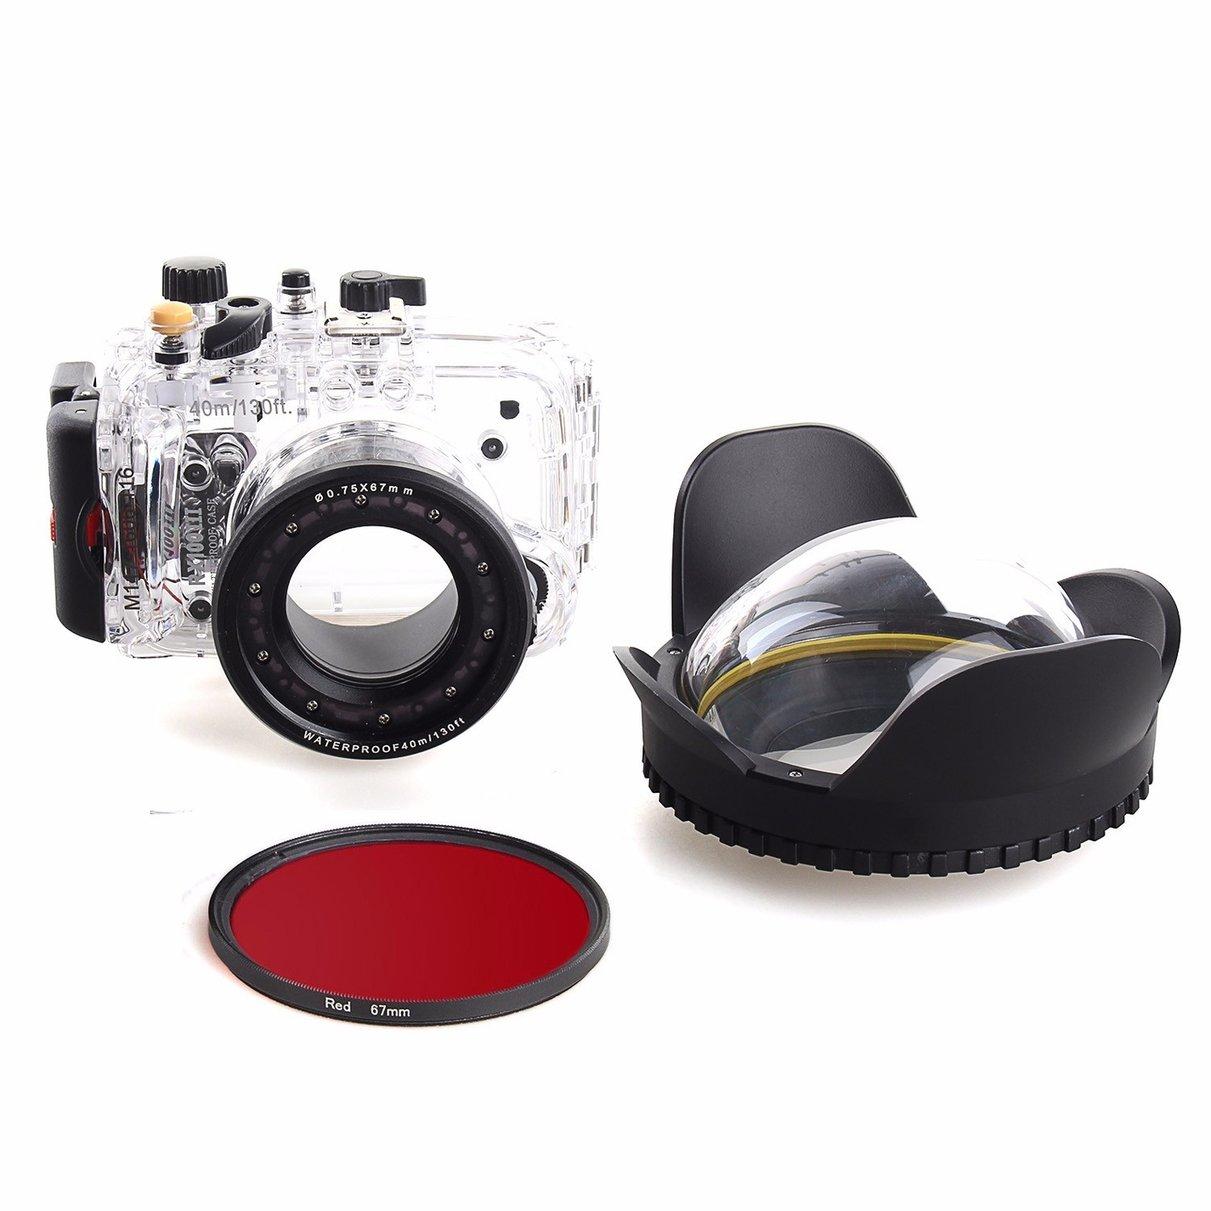 40m/130f Waterproof Underwater Housing Case For Sony RX100 III + 67mm Red Filter + 67mm Fisheye Lens dome port